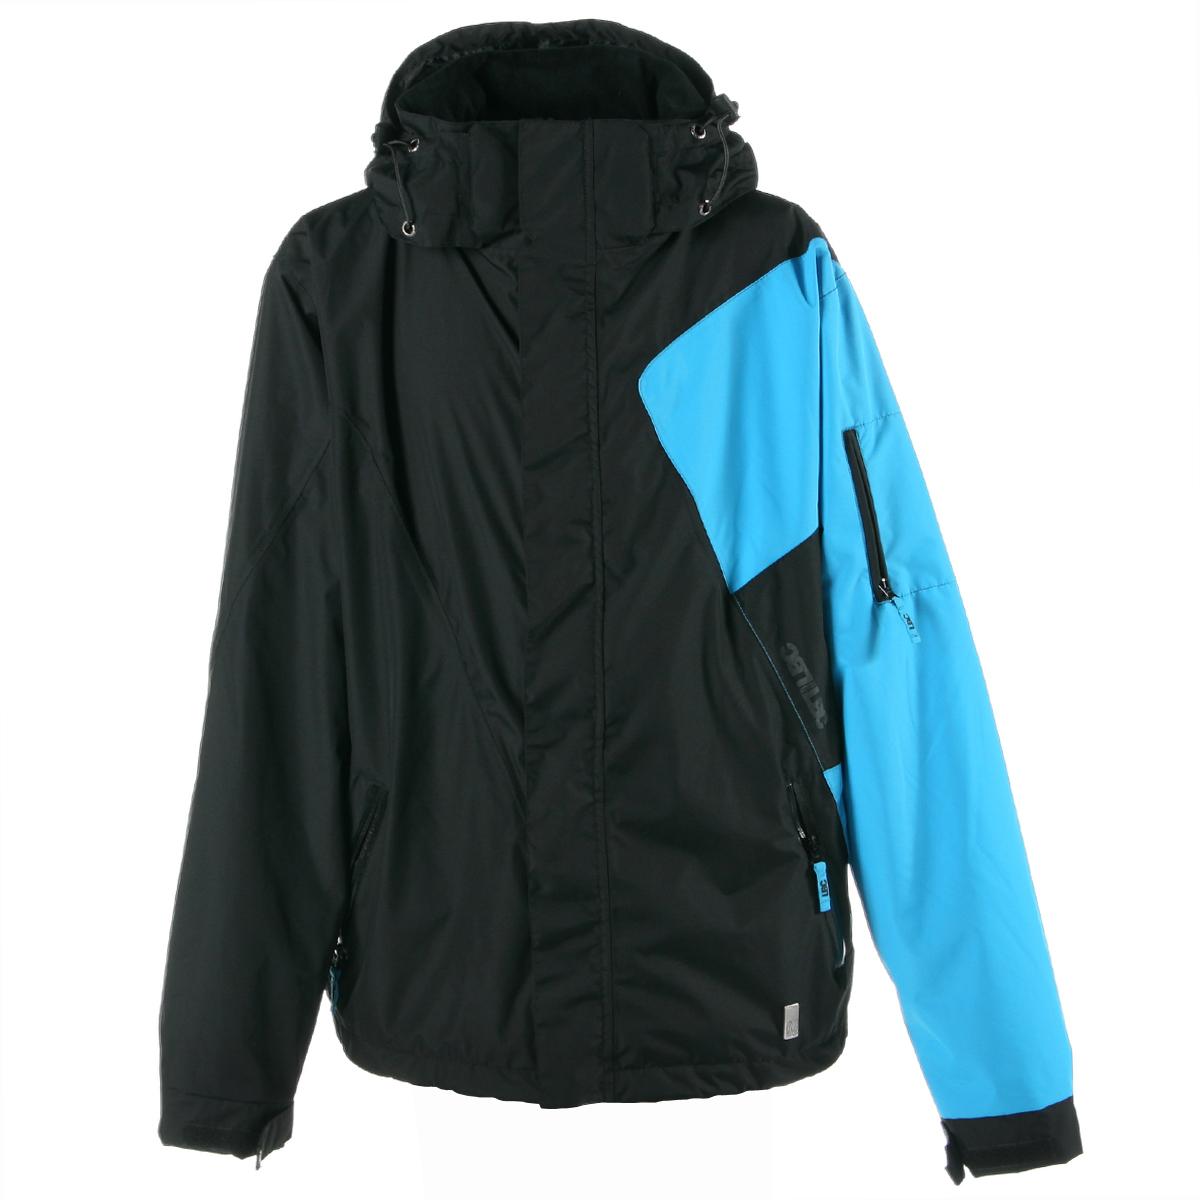 light free snowboardjacket